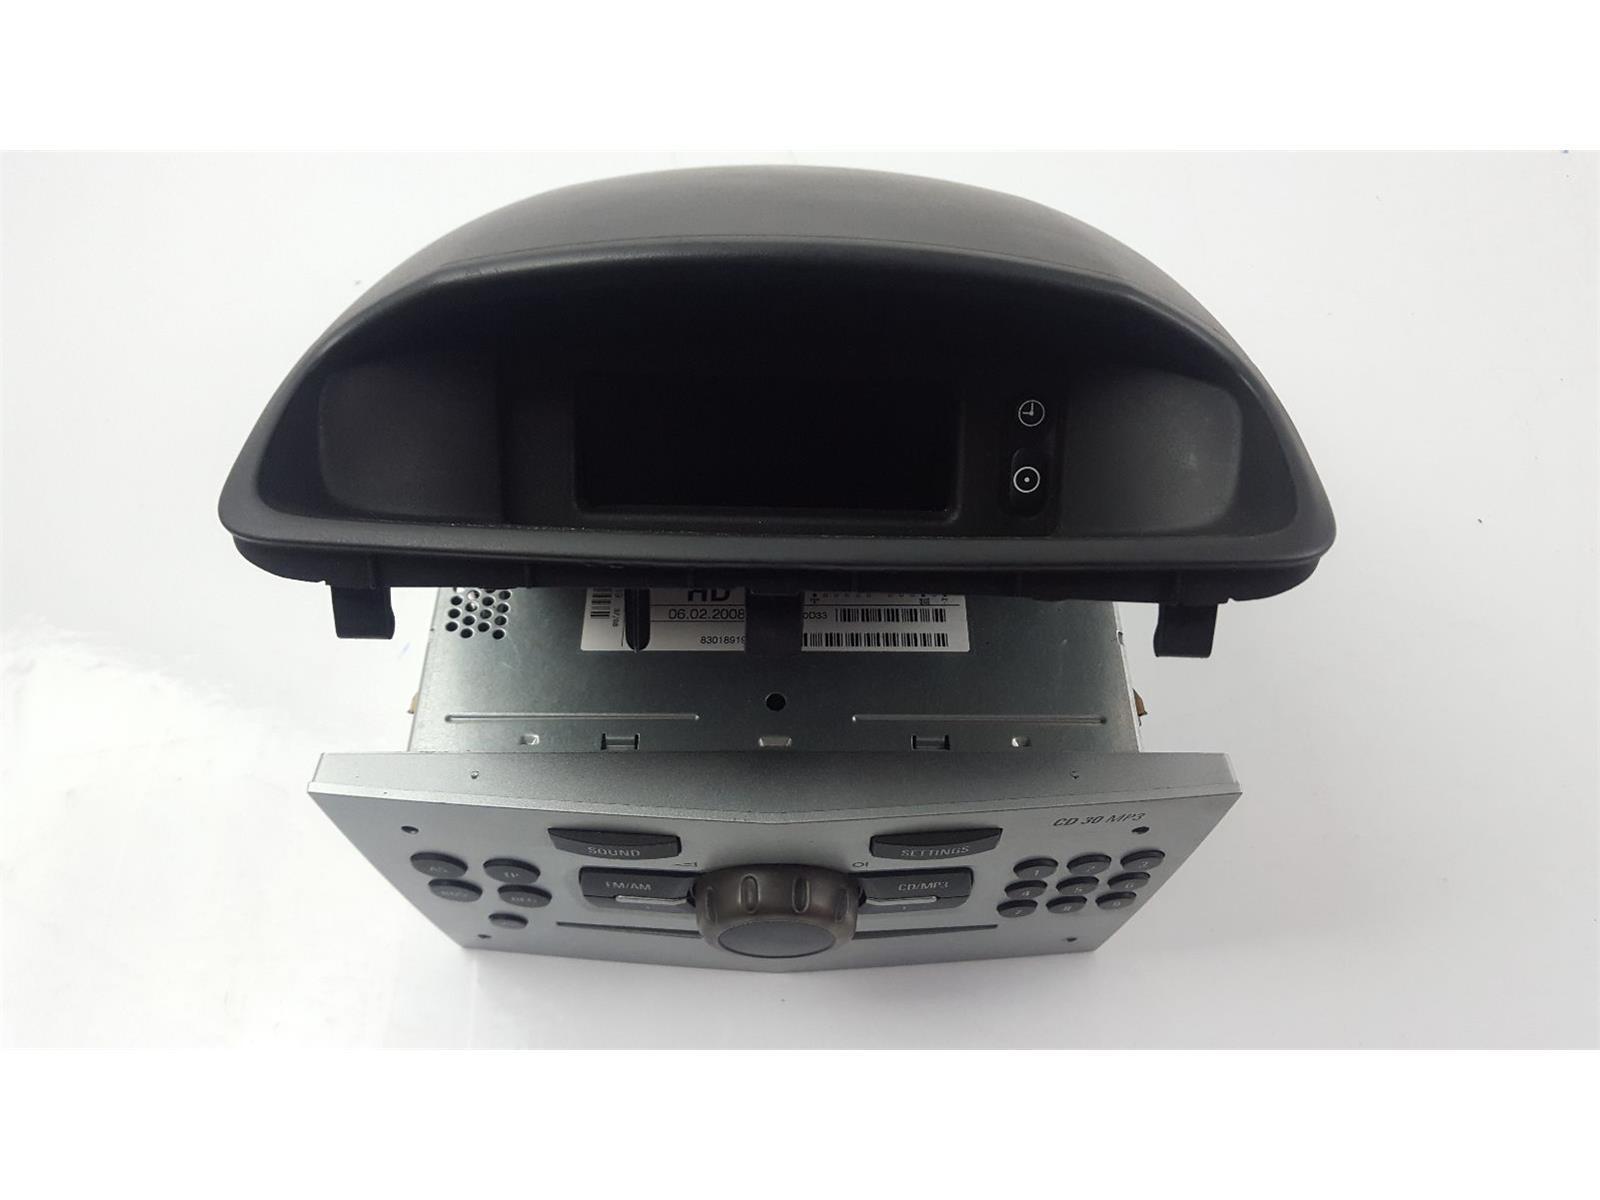 Vauxhall corsa 2007 to 2011 radio cd player petrol manual for 2008 mk3 vauxhall corsa d radio cd player cd30 mp3 13289919 13284430 sciox Images